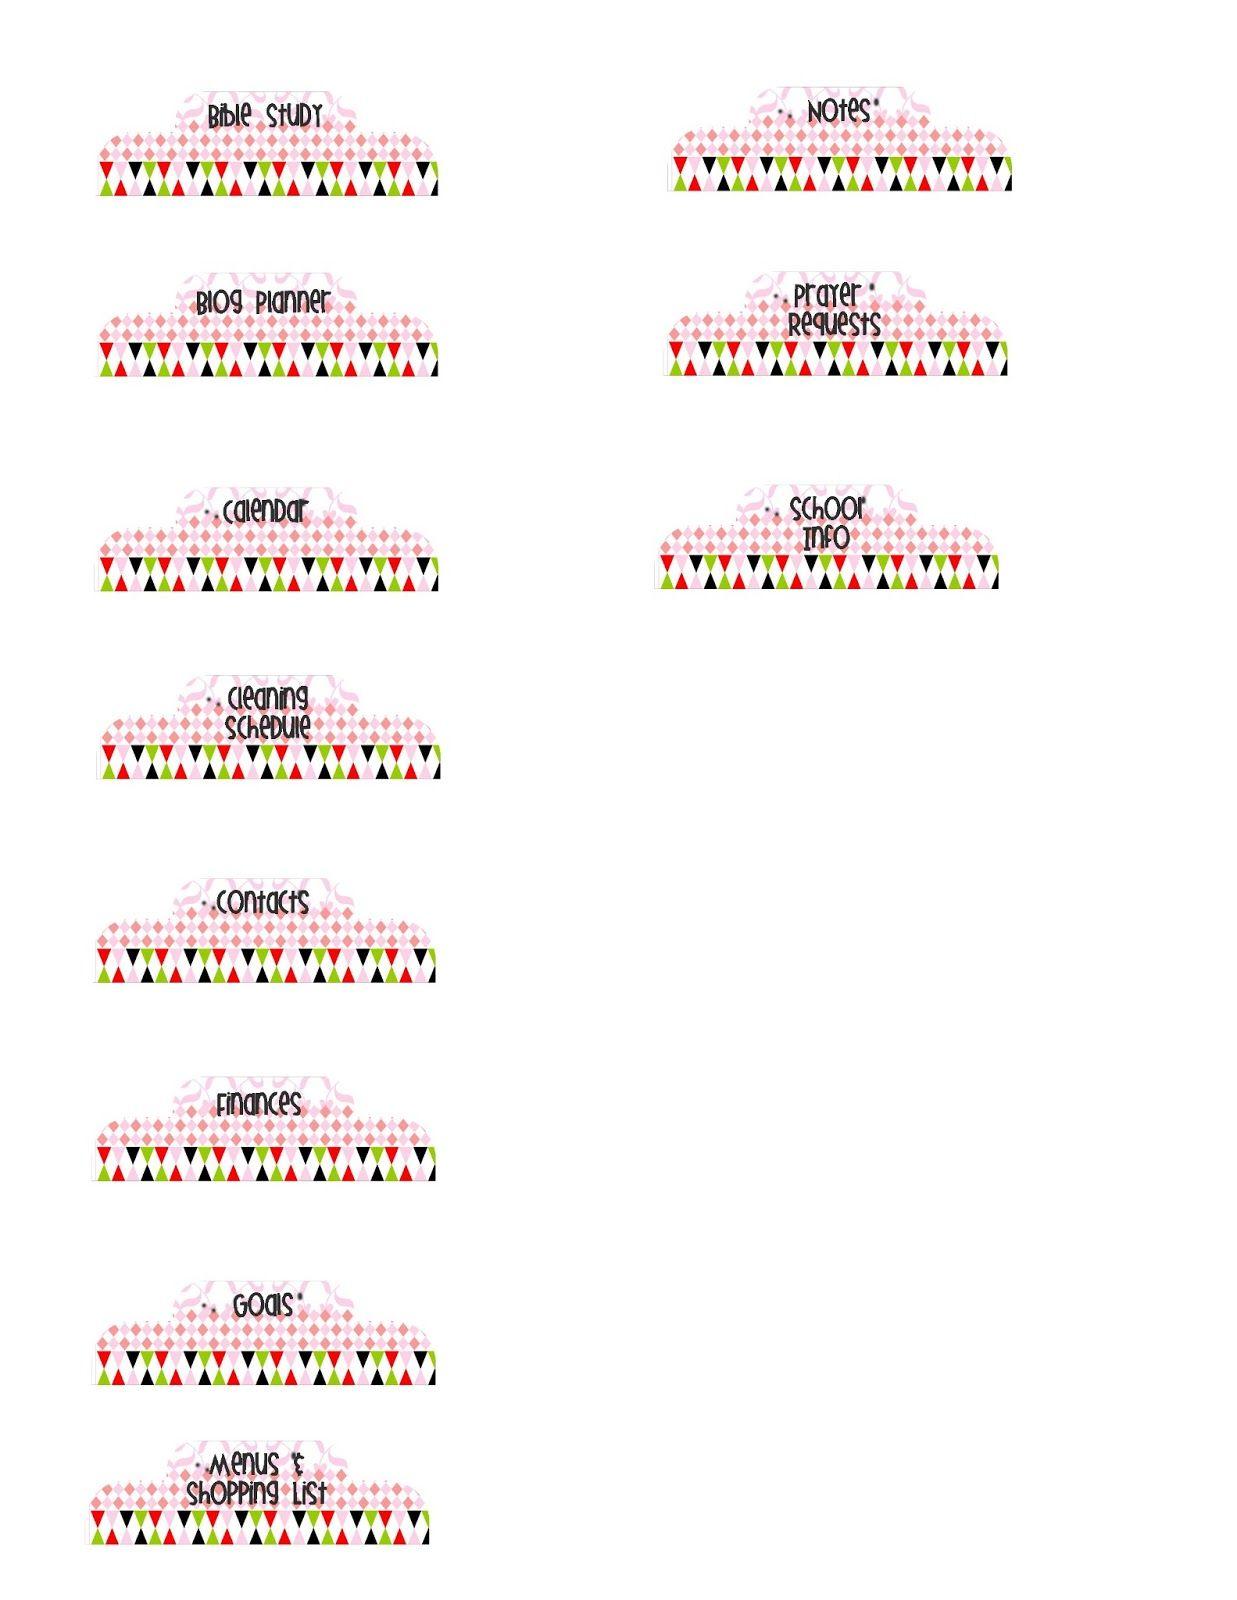 Weekly blog goals printable planner dividers pinterest